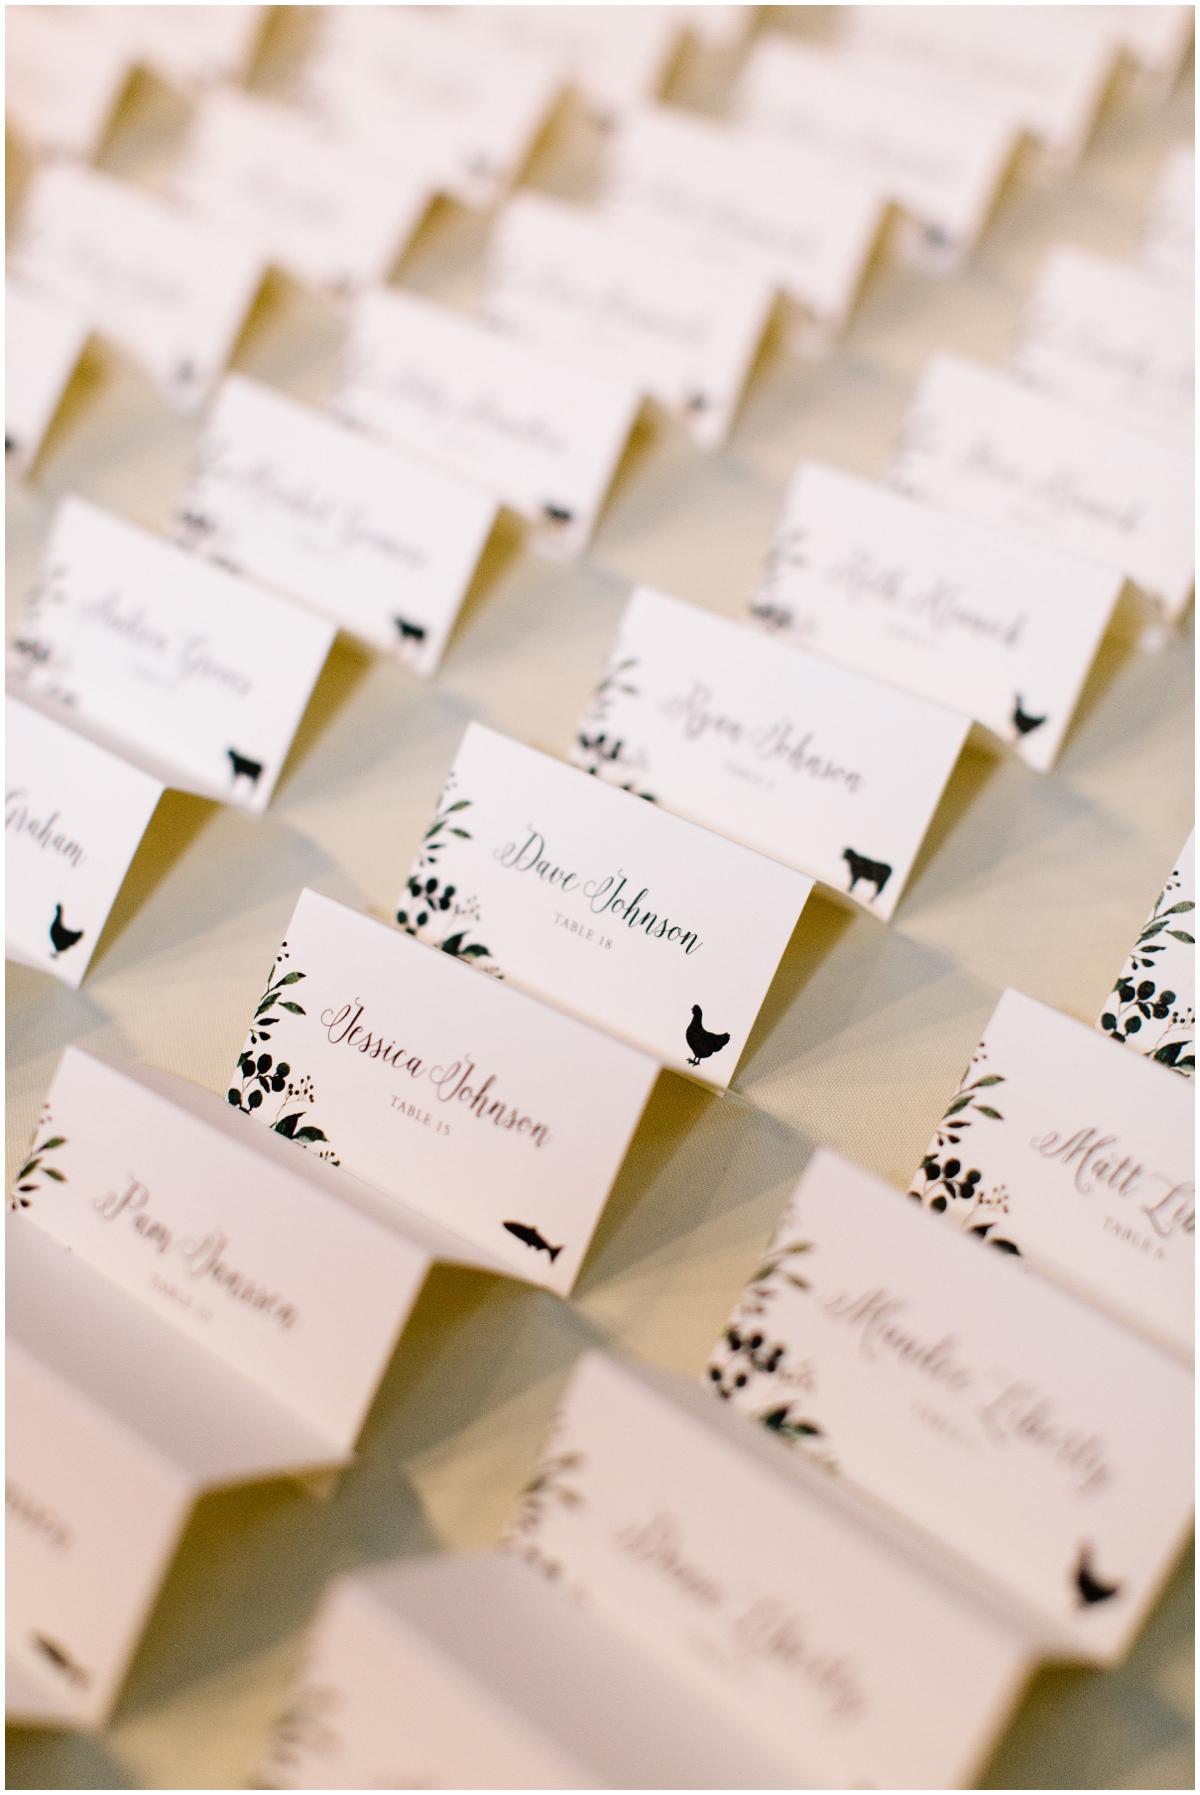 Greenery boho themed wedding name tags